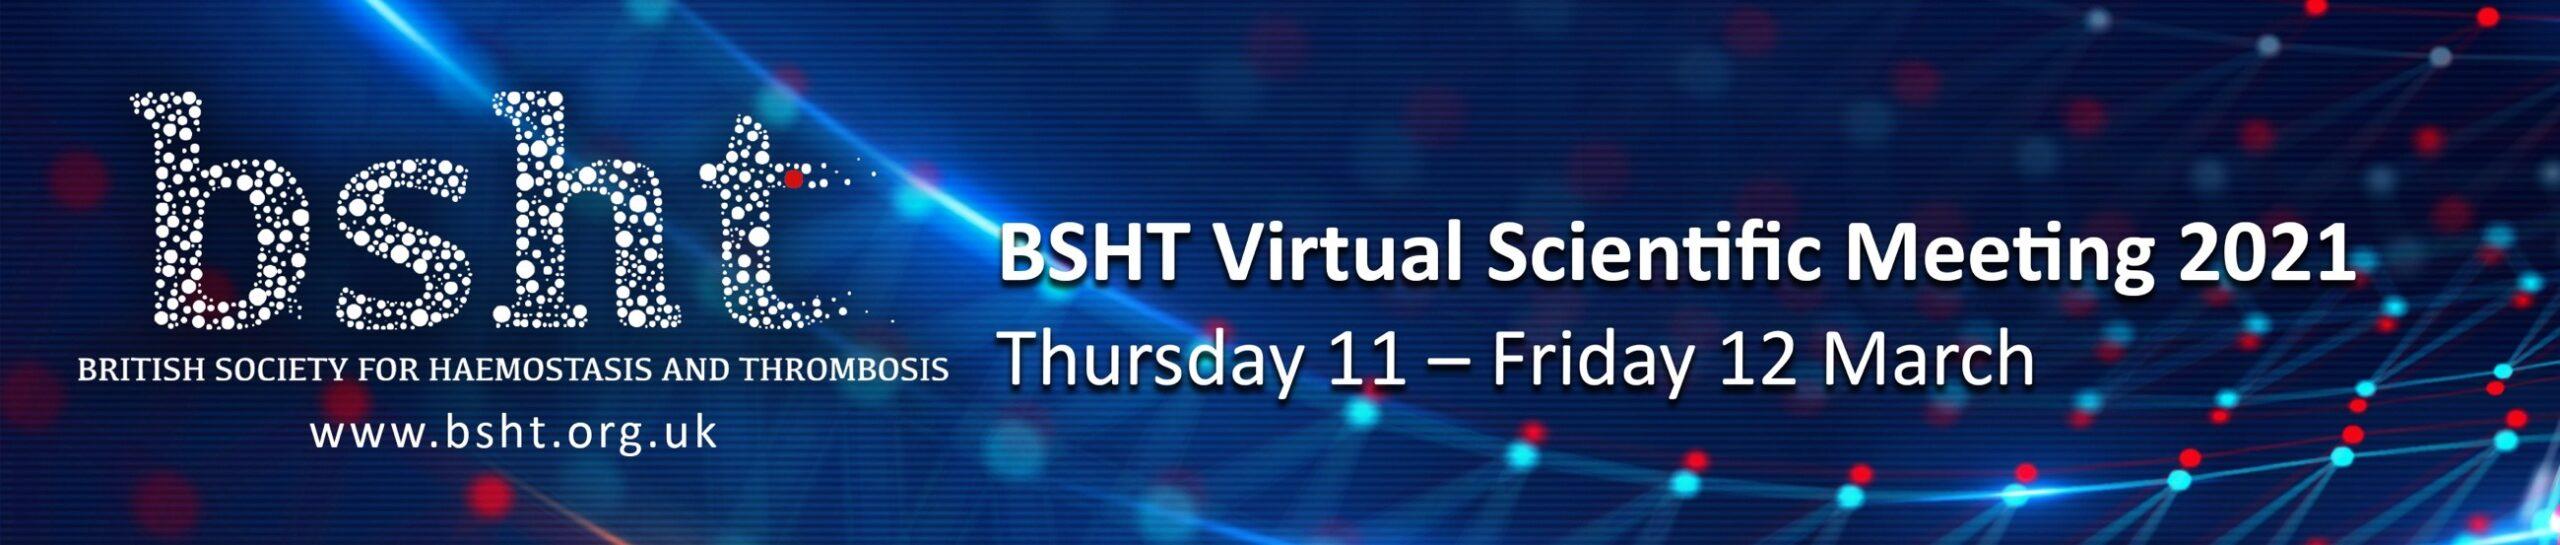 BSHT 2021 Virtual Scientific Meeting